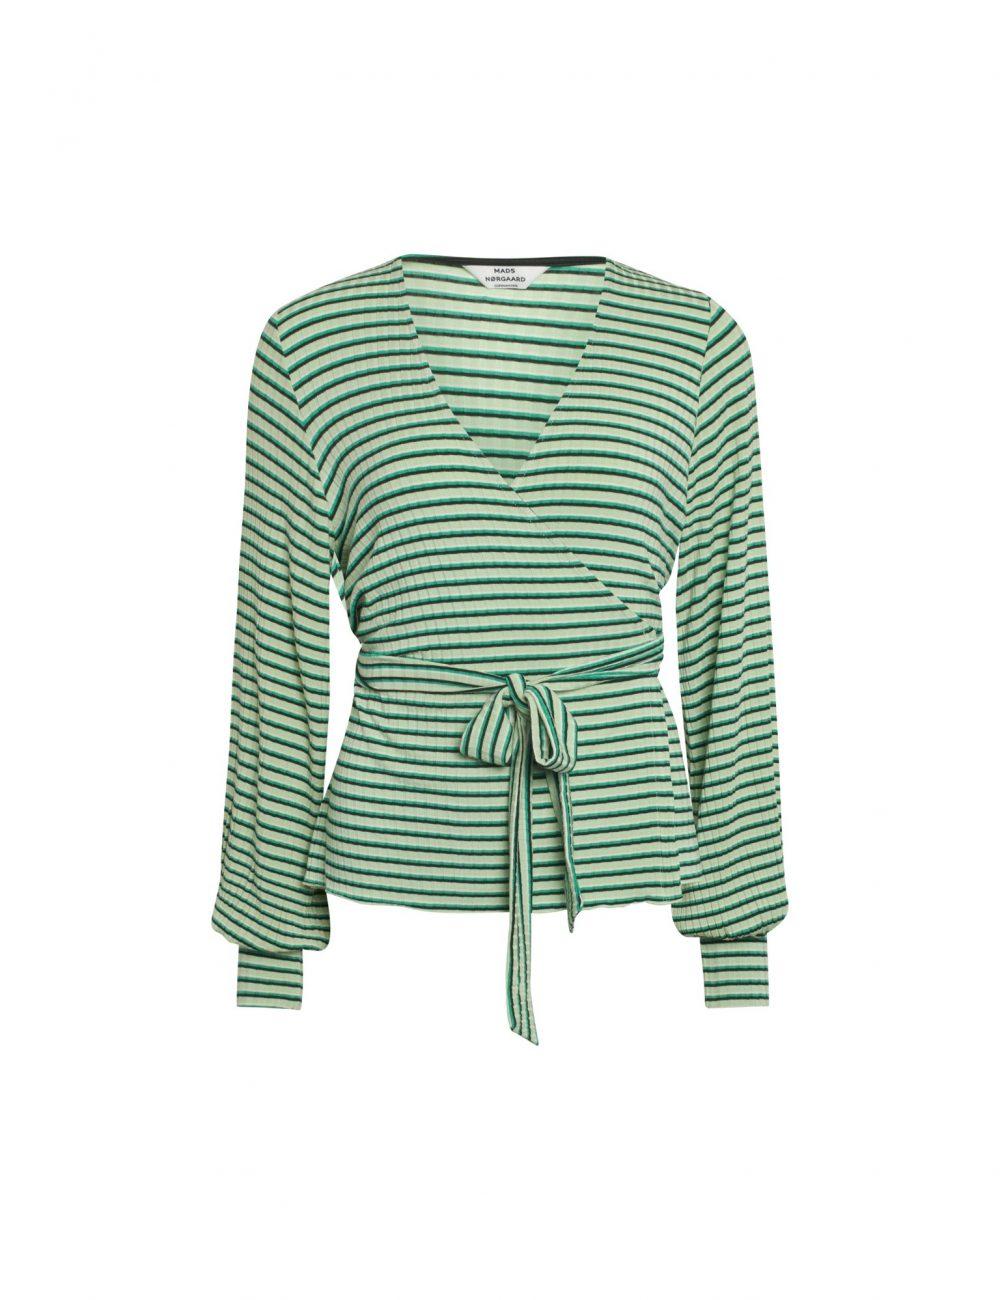 Organic Stripe Shirt White/Black